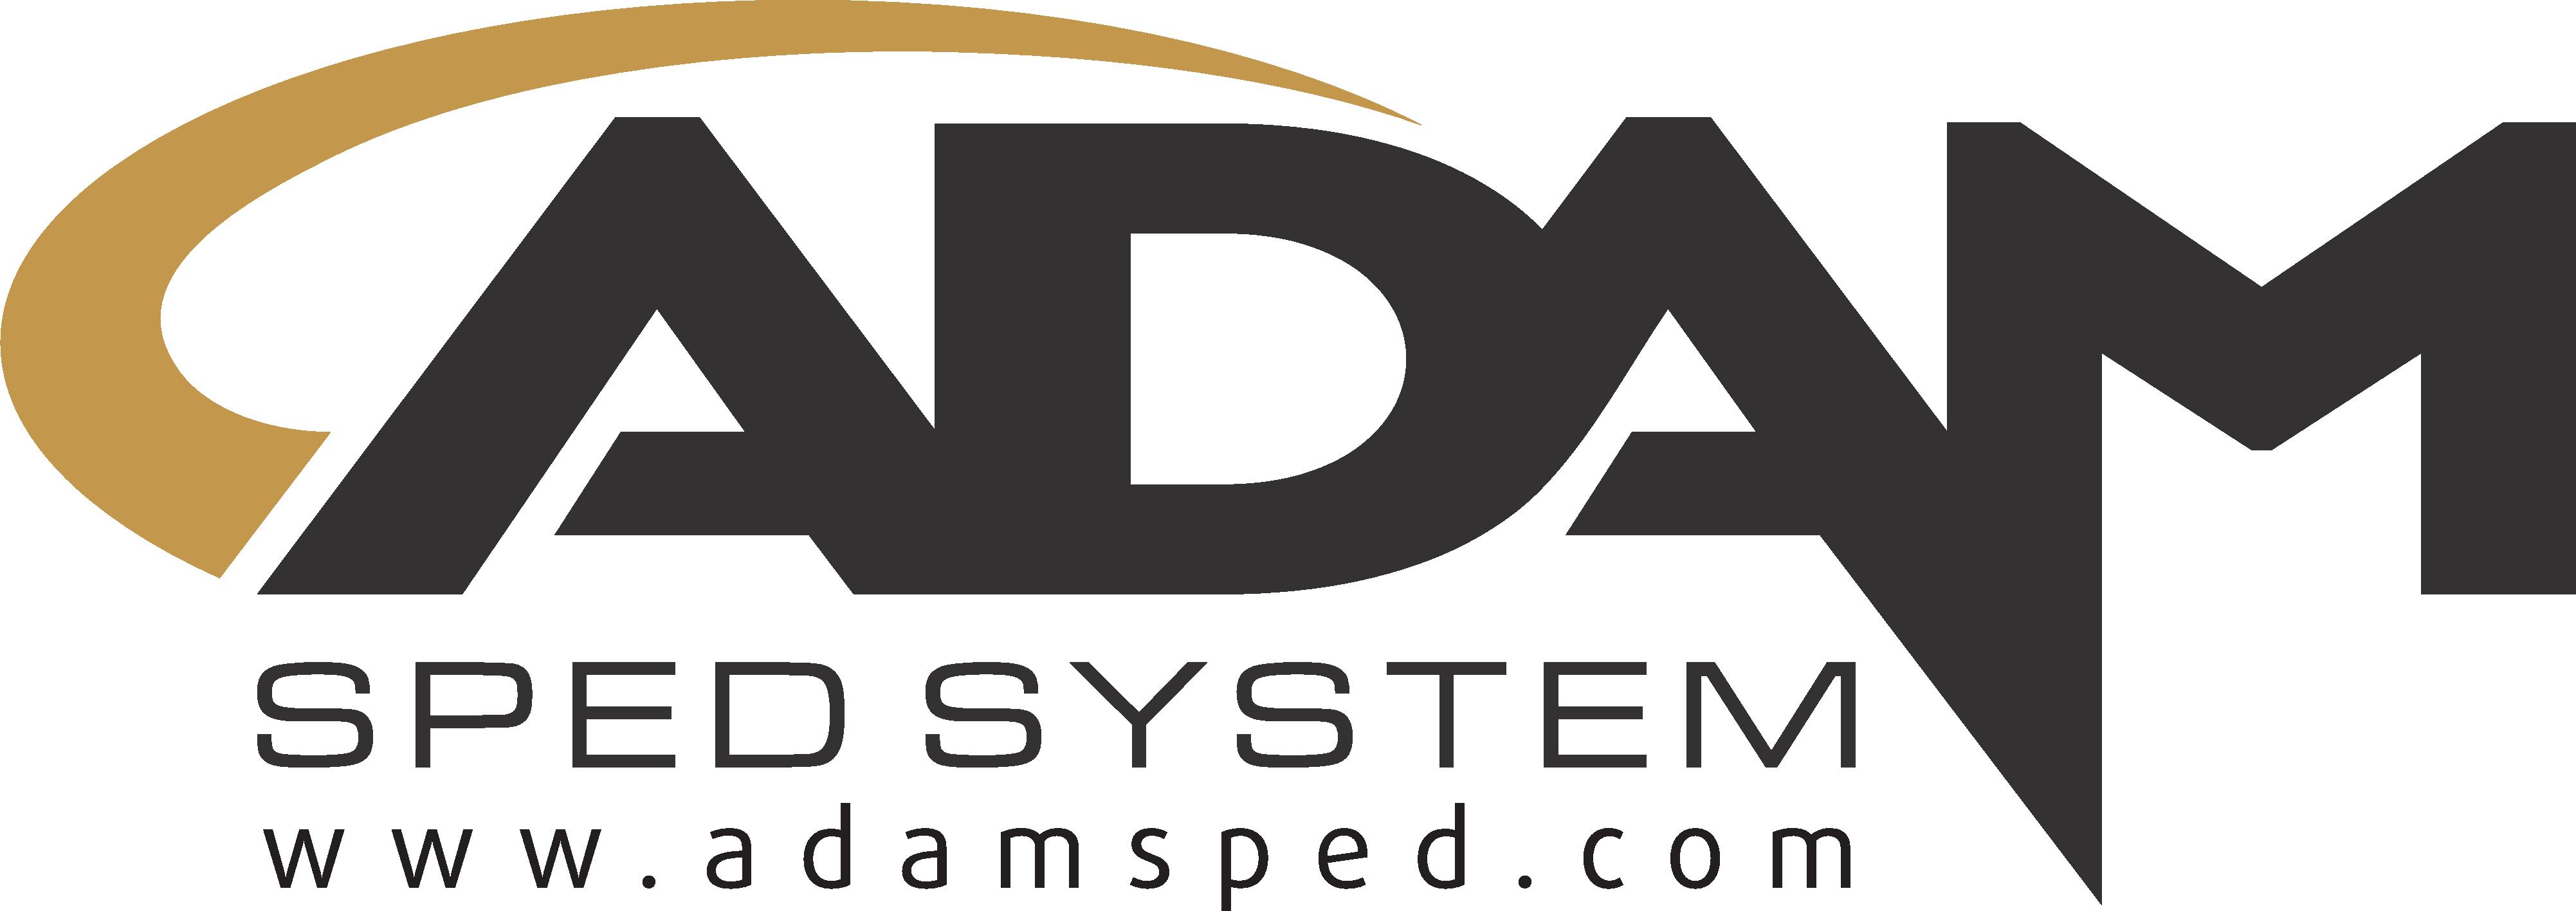 Adamsped logo